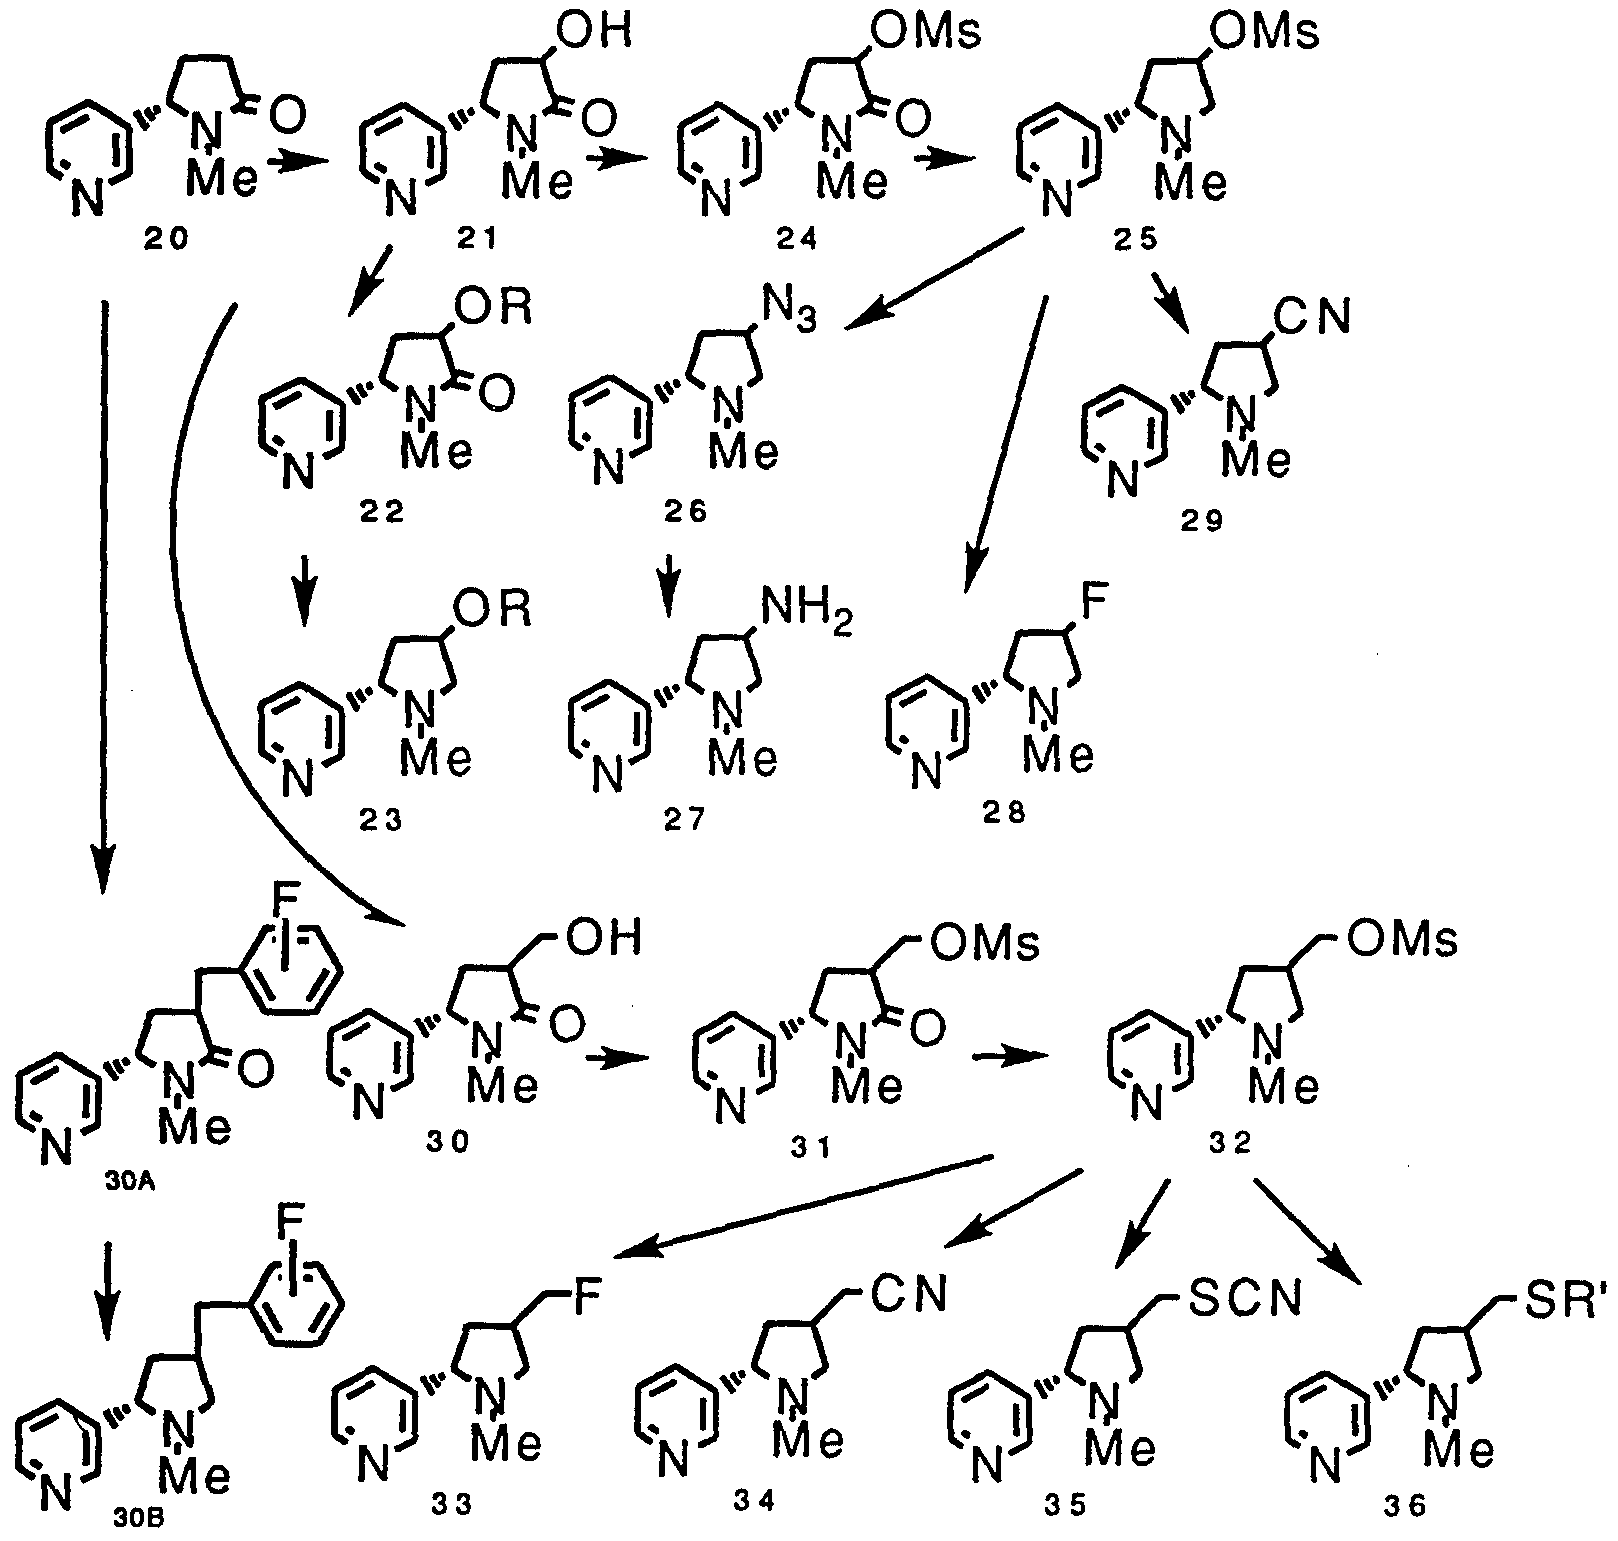 tags: #lewis dot diagram for lithium neutron#lewis dot diagram for  helium#lewis dot diagram for strontium#cation lewis dot diagram for h#lewis  dot model for